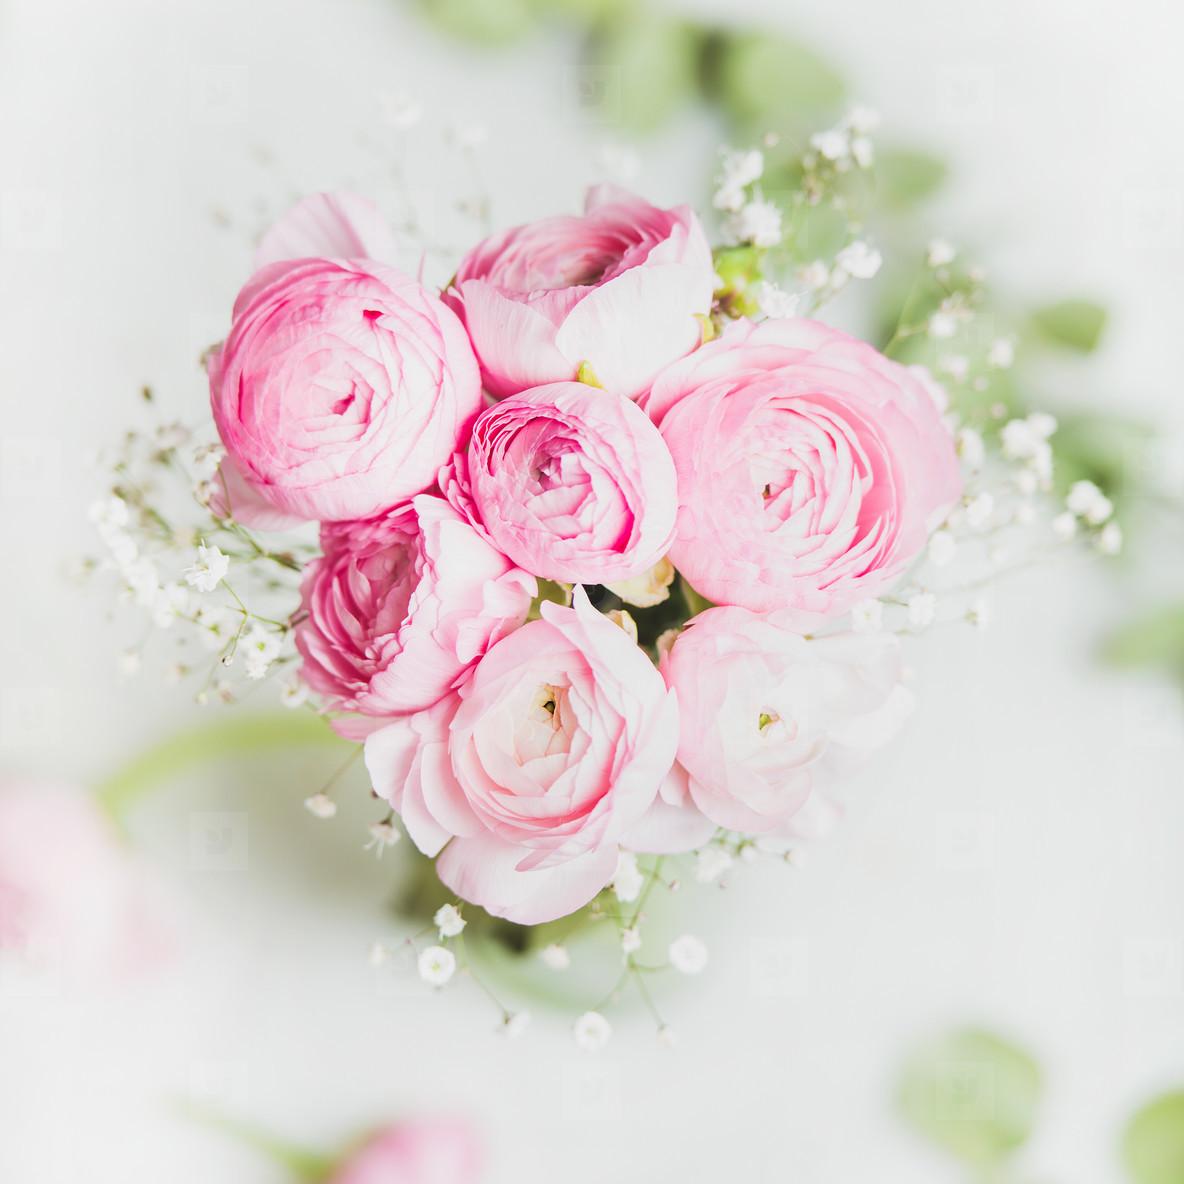 Light pink ranunkulus flowers on white background